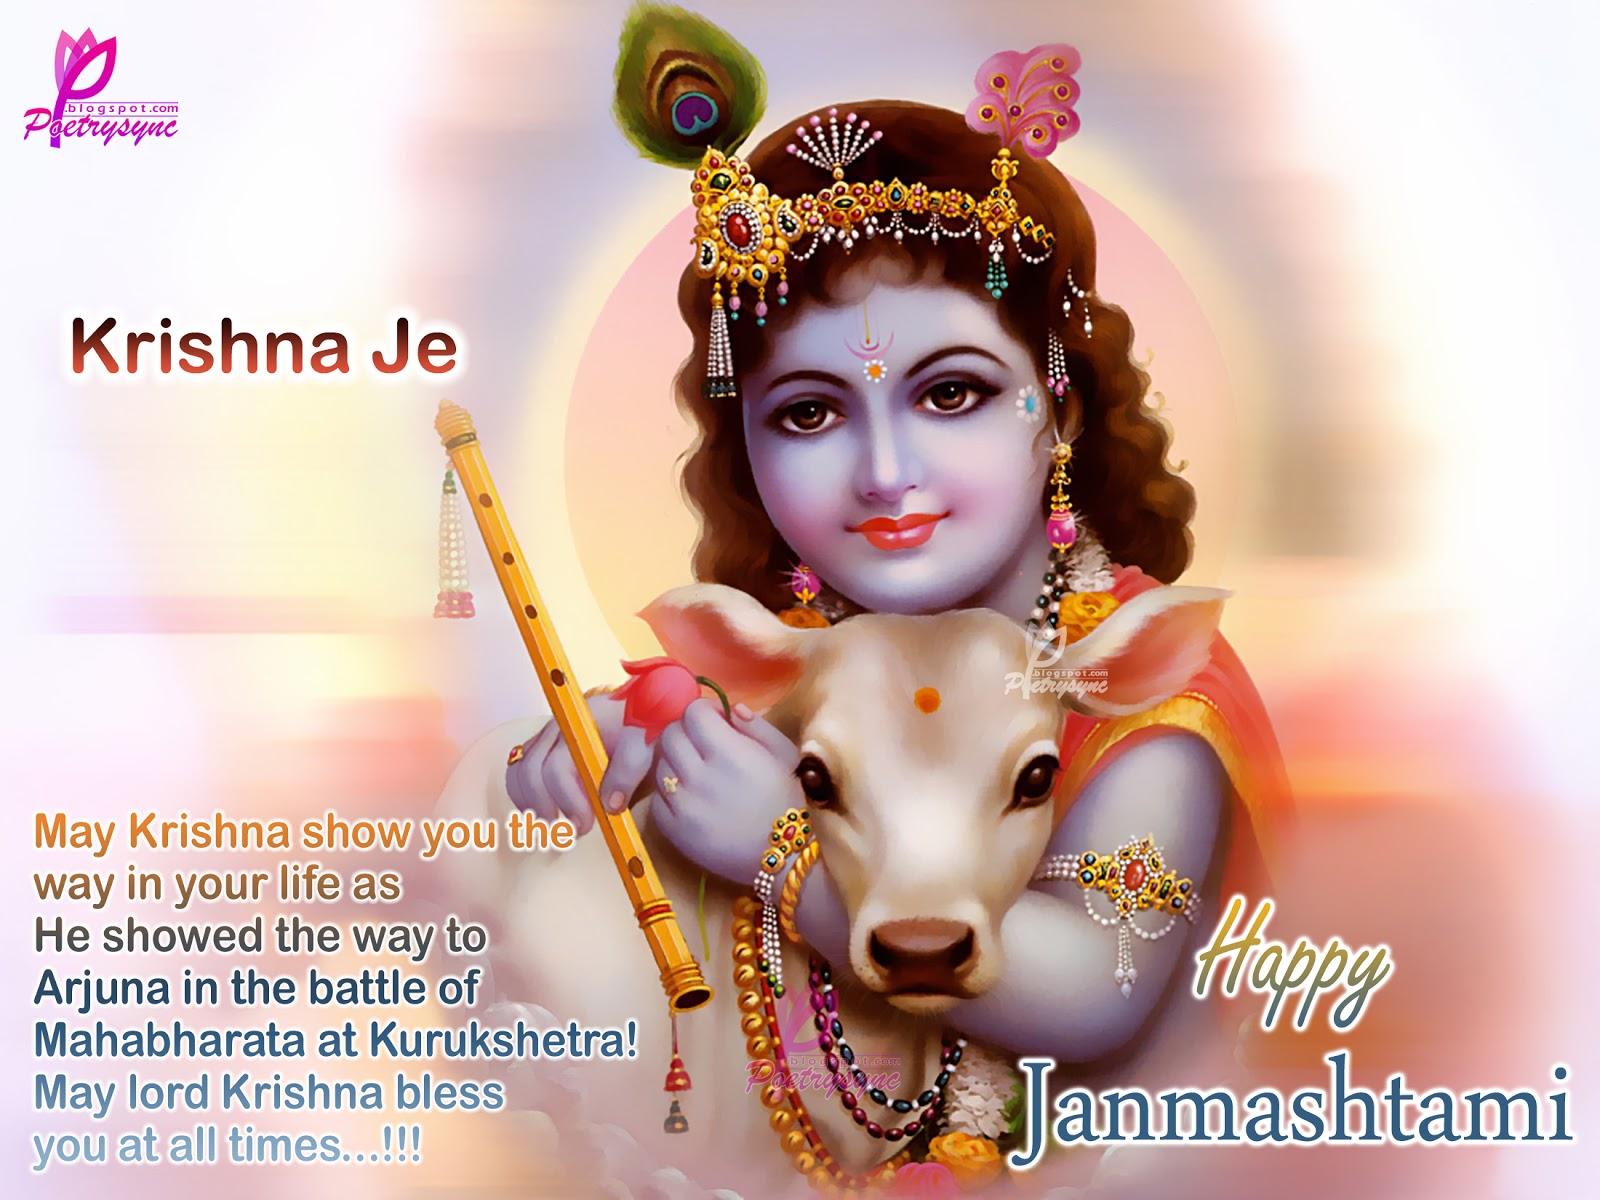 Happy Krishna Janmashtami Greetings Cards in english